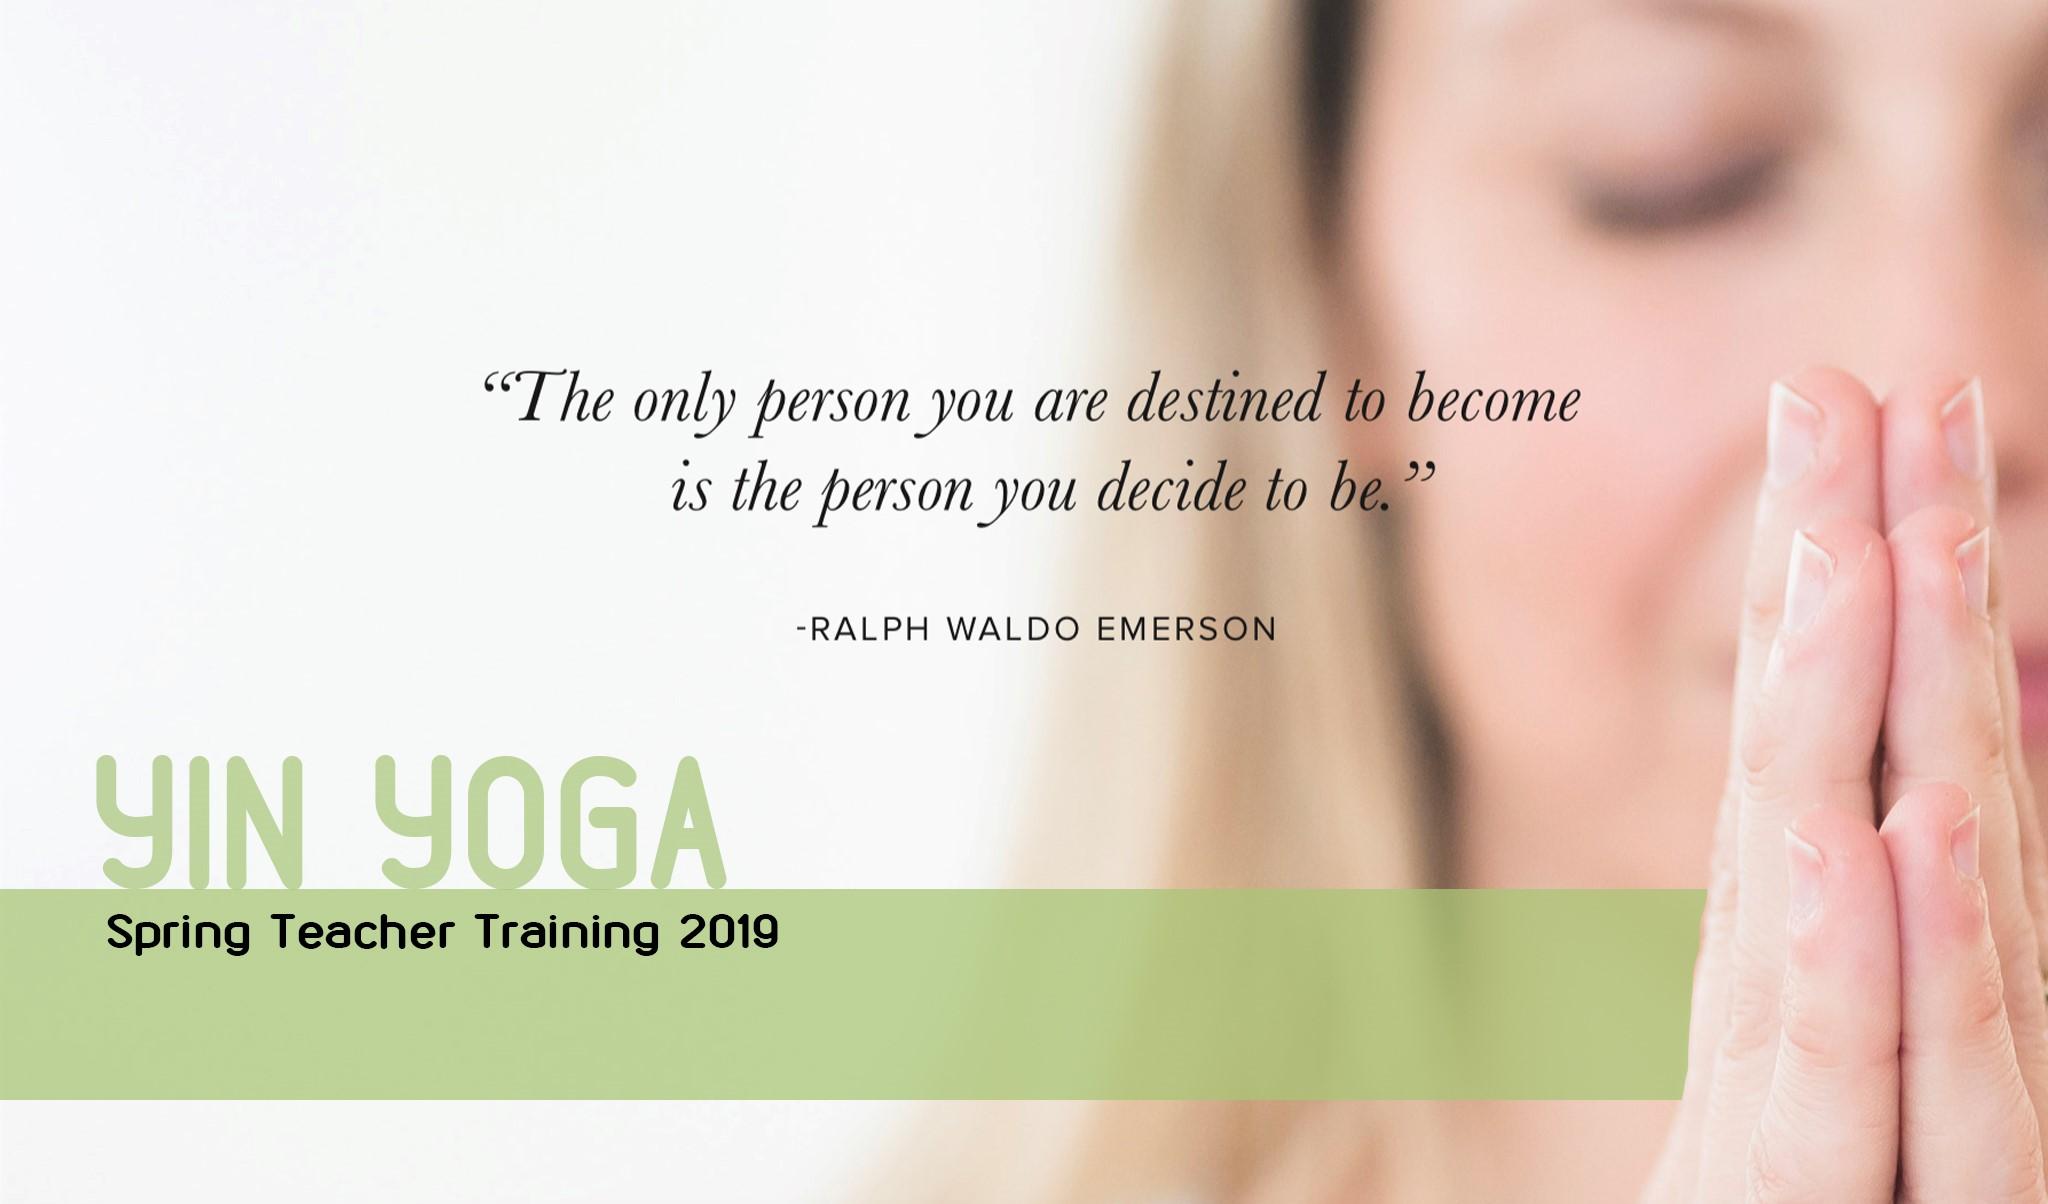 Yin Yoga Courser - Spring 2018 at d'Pilates